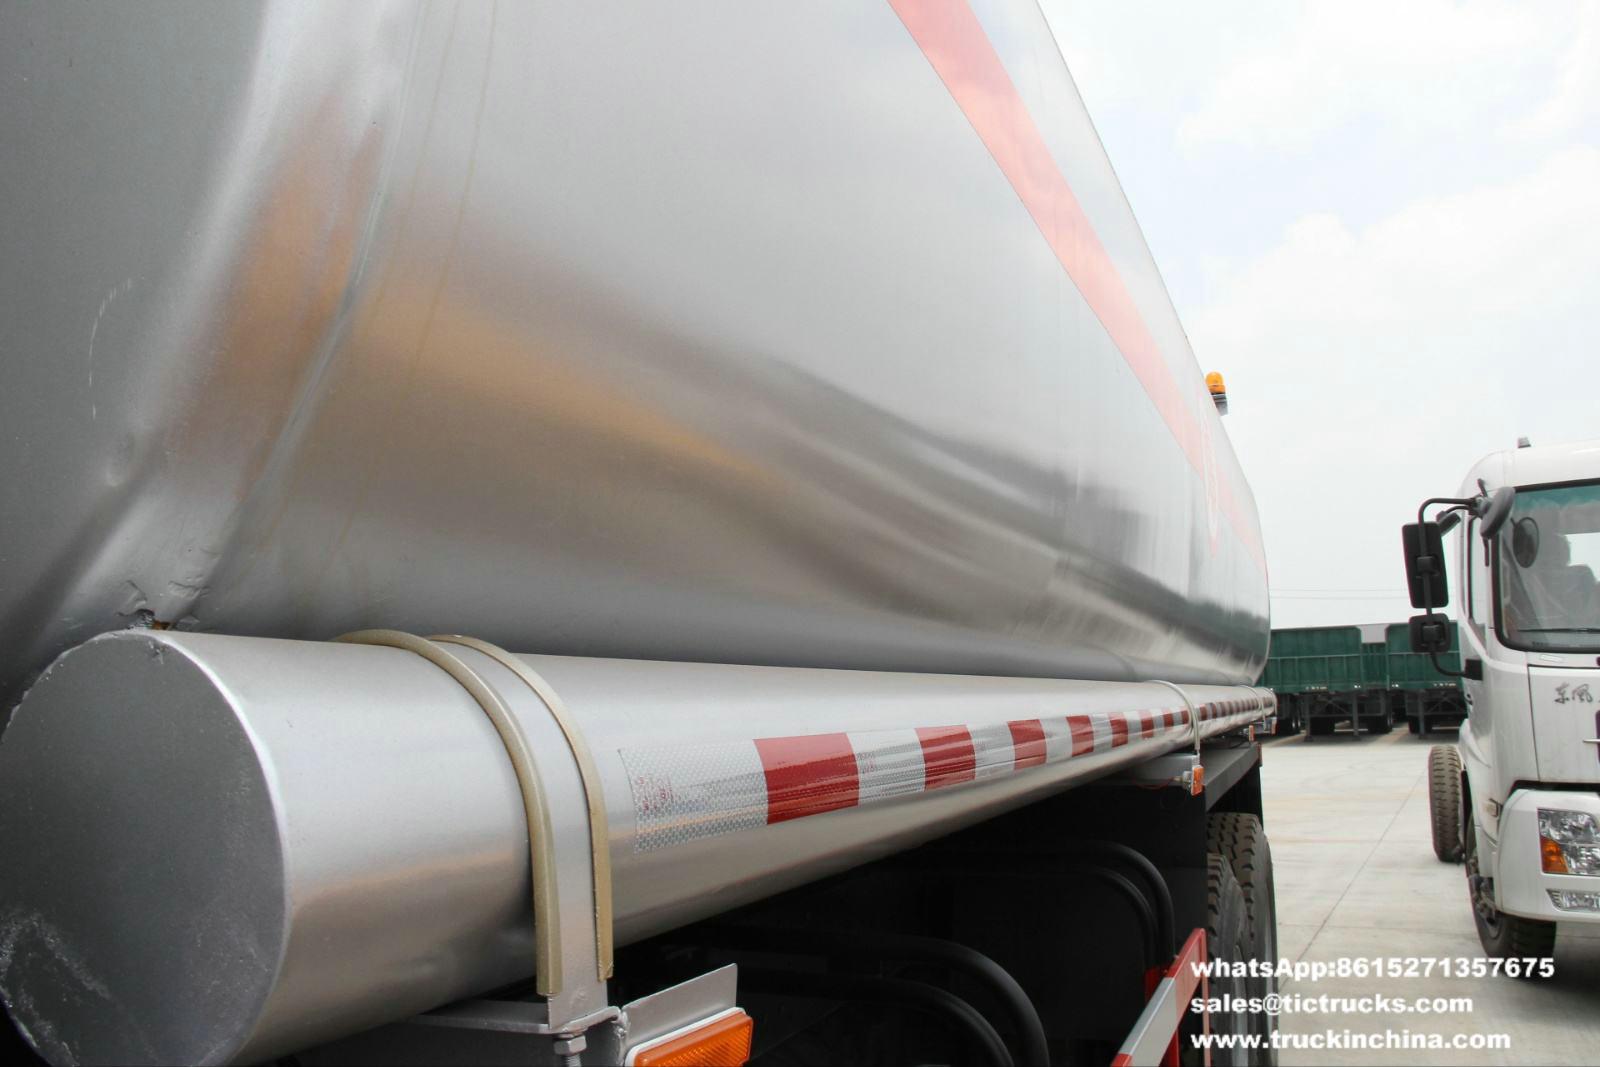 Shacman S2000 6x4 Oil Truck_1.jpg